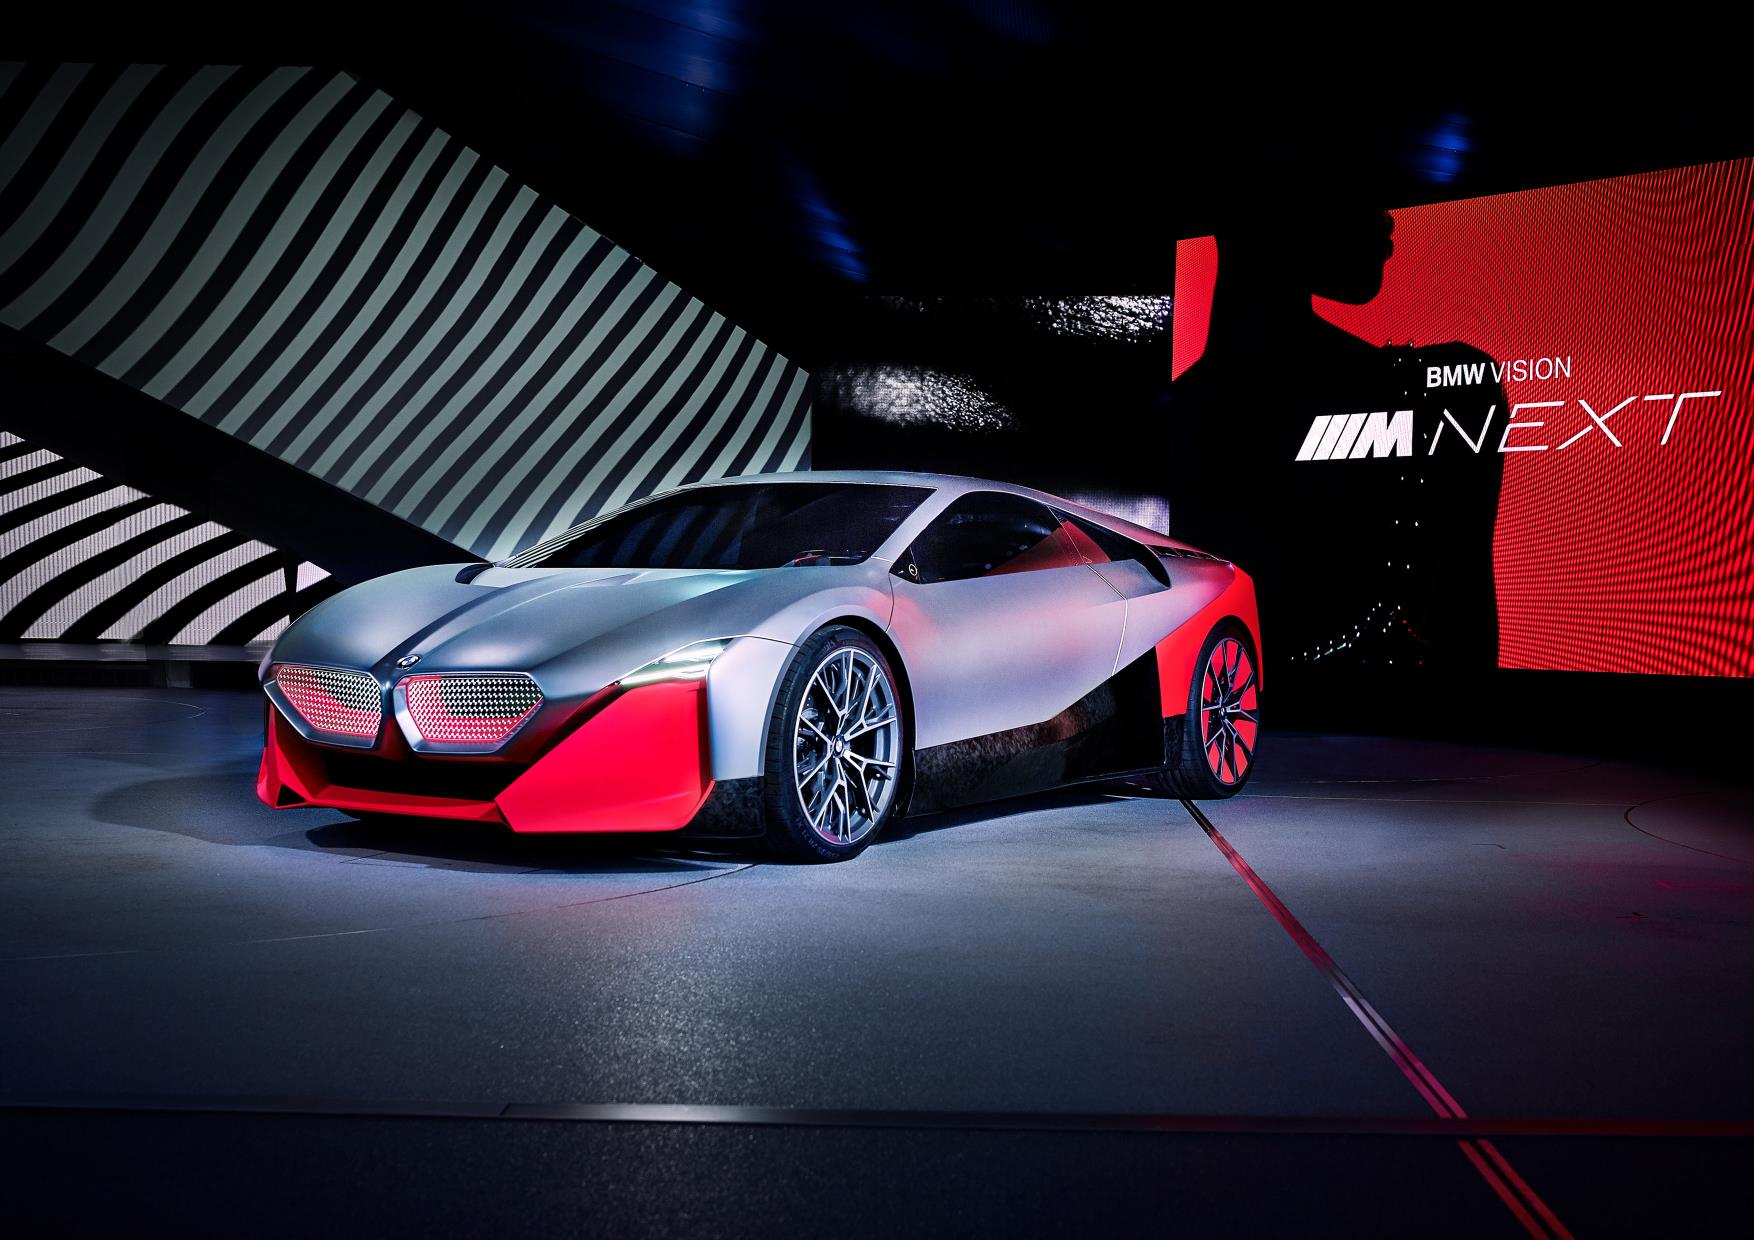 2019 BMW Concept Car